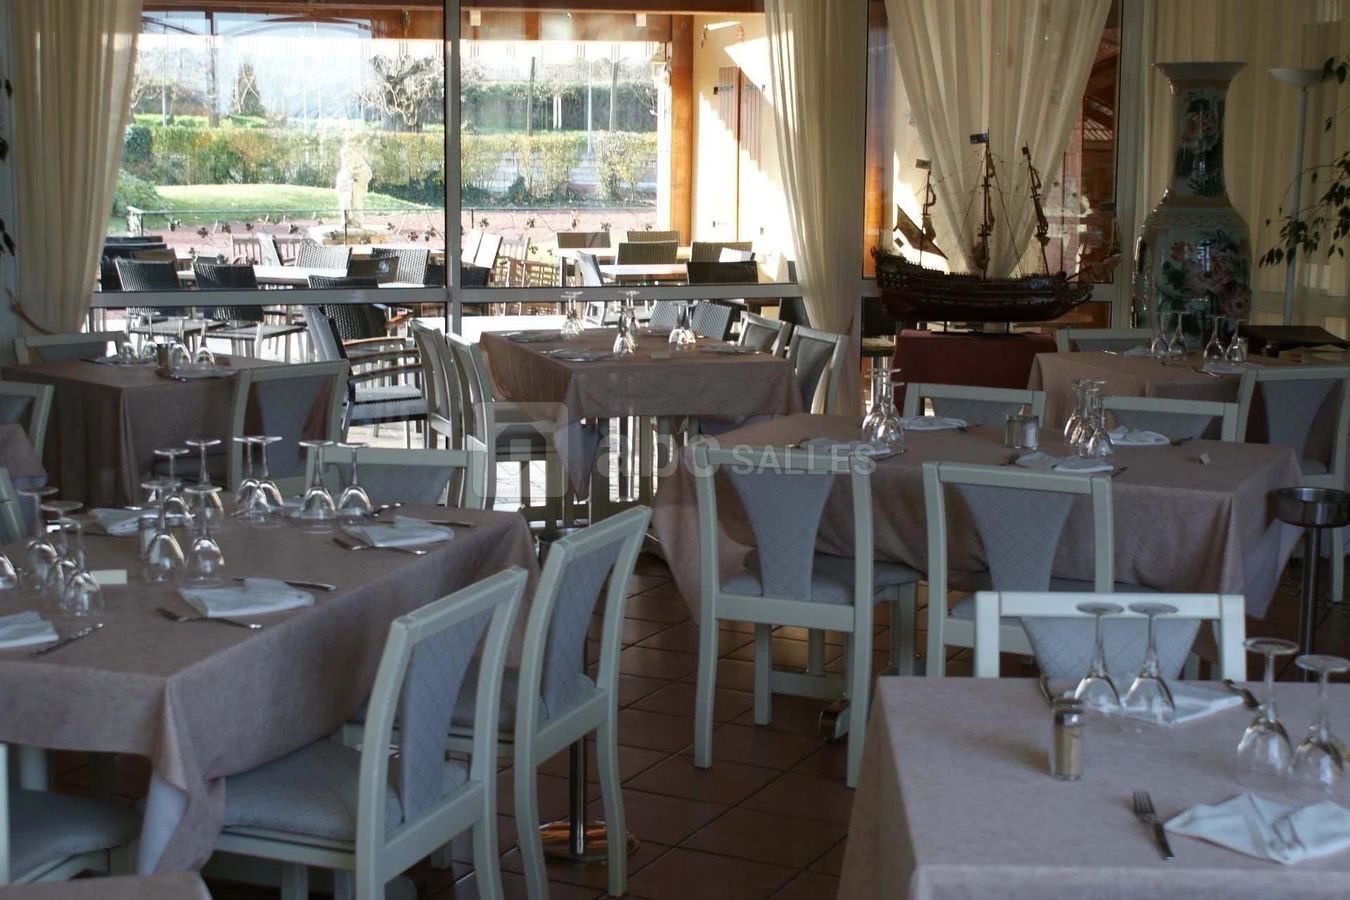 Restaurant Le Relais Fleuri - ABC Salles